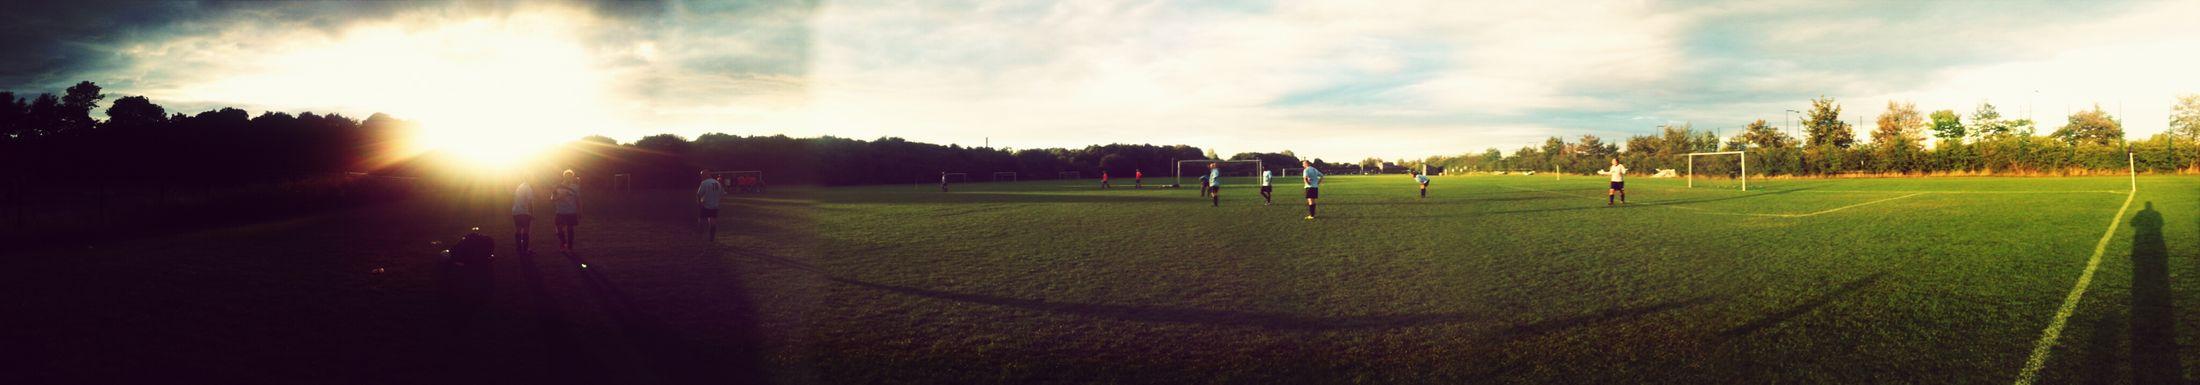 VB2 Oldboys Fodbold